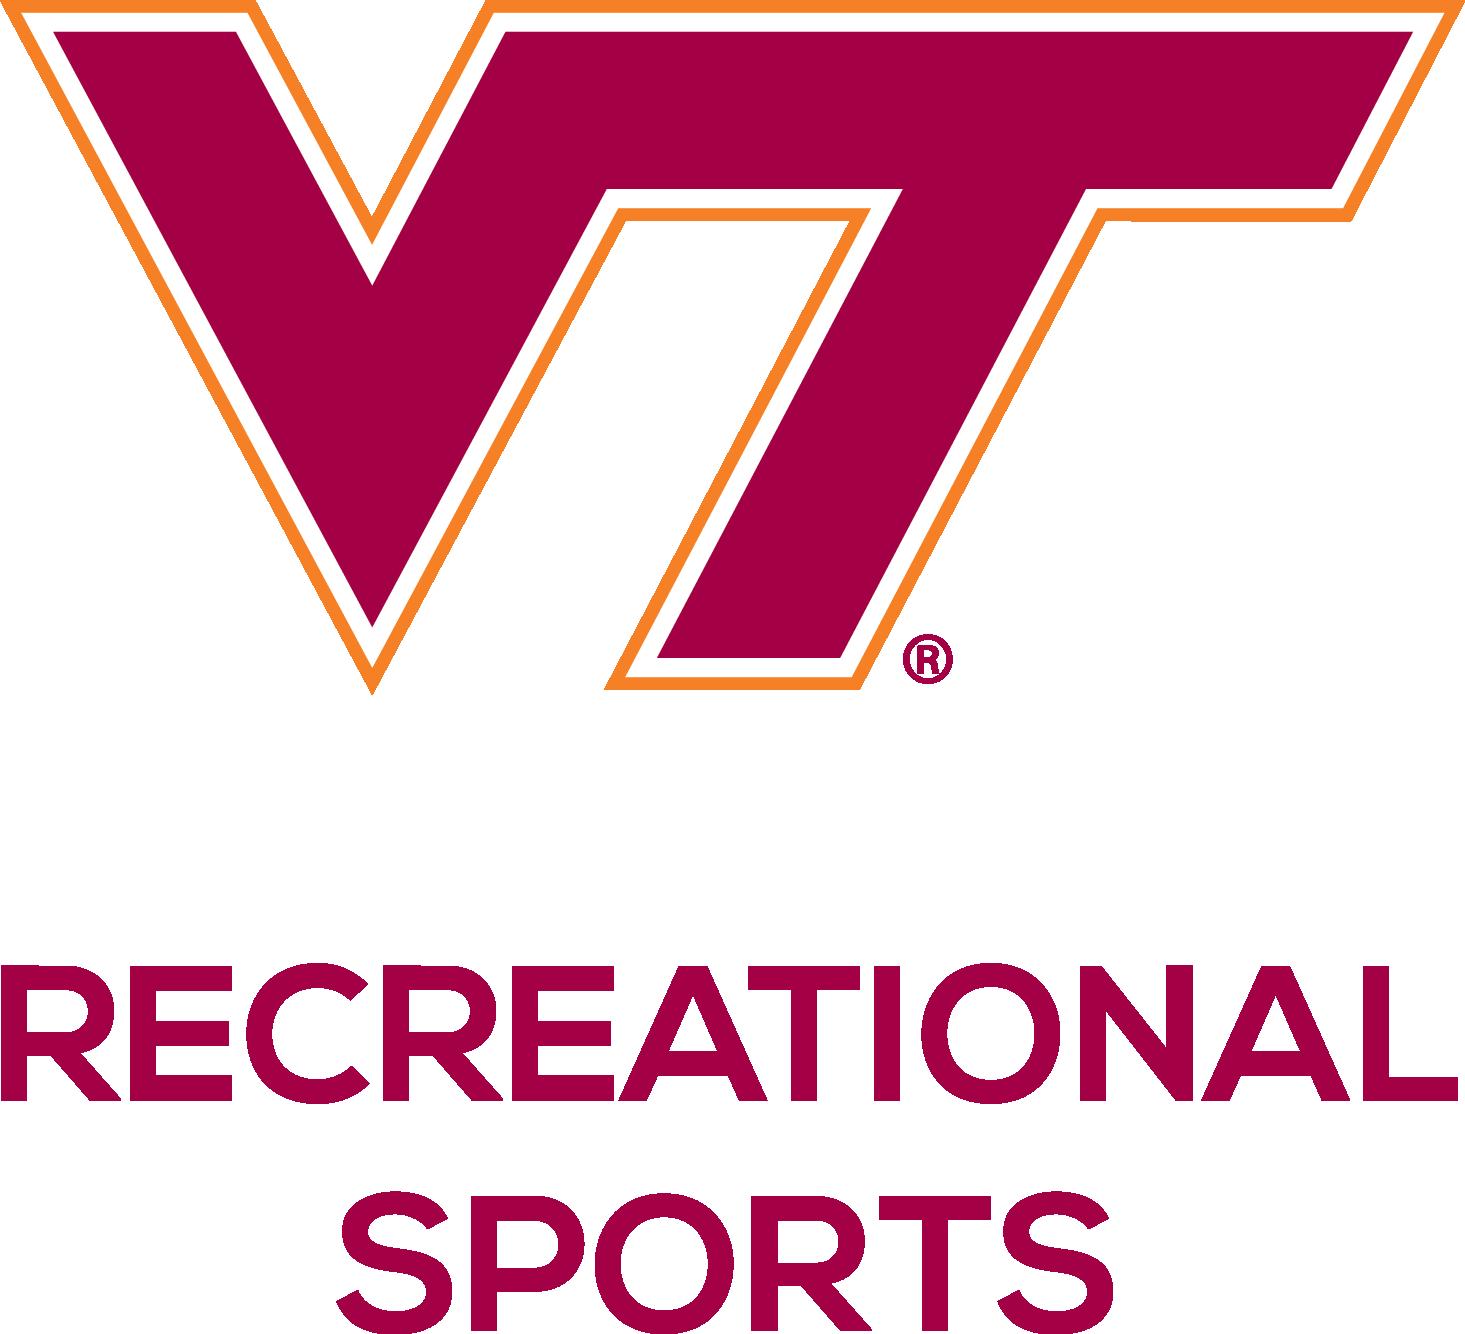 Virginia Tech Recreational Sports